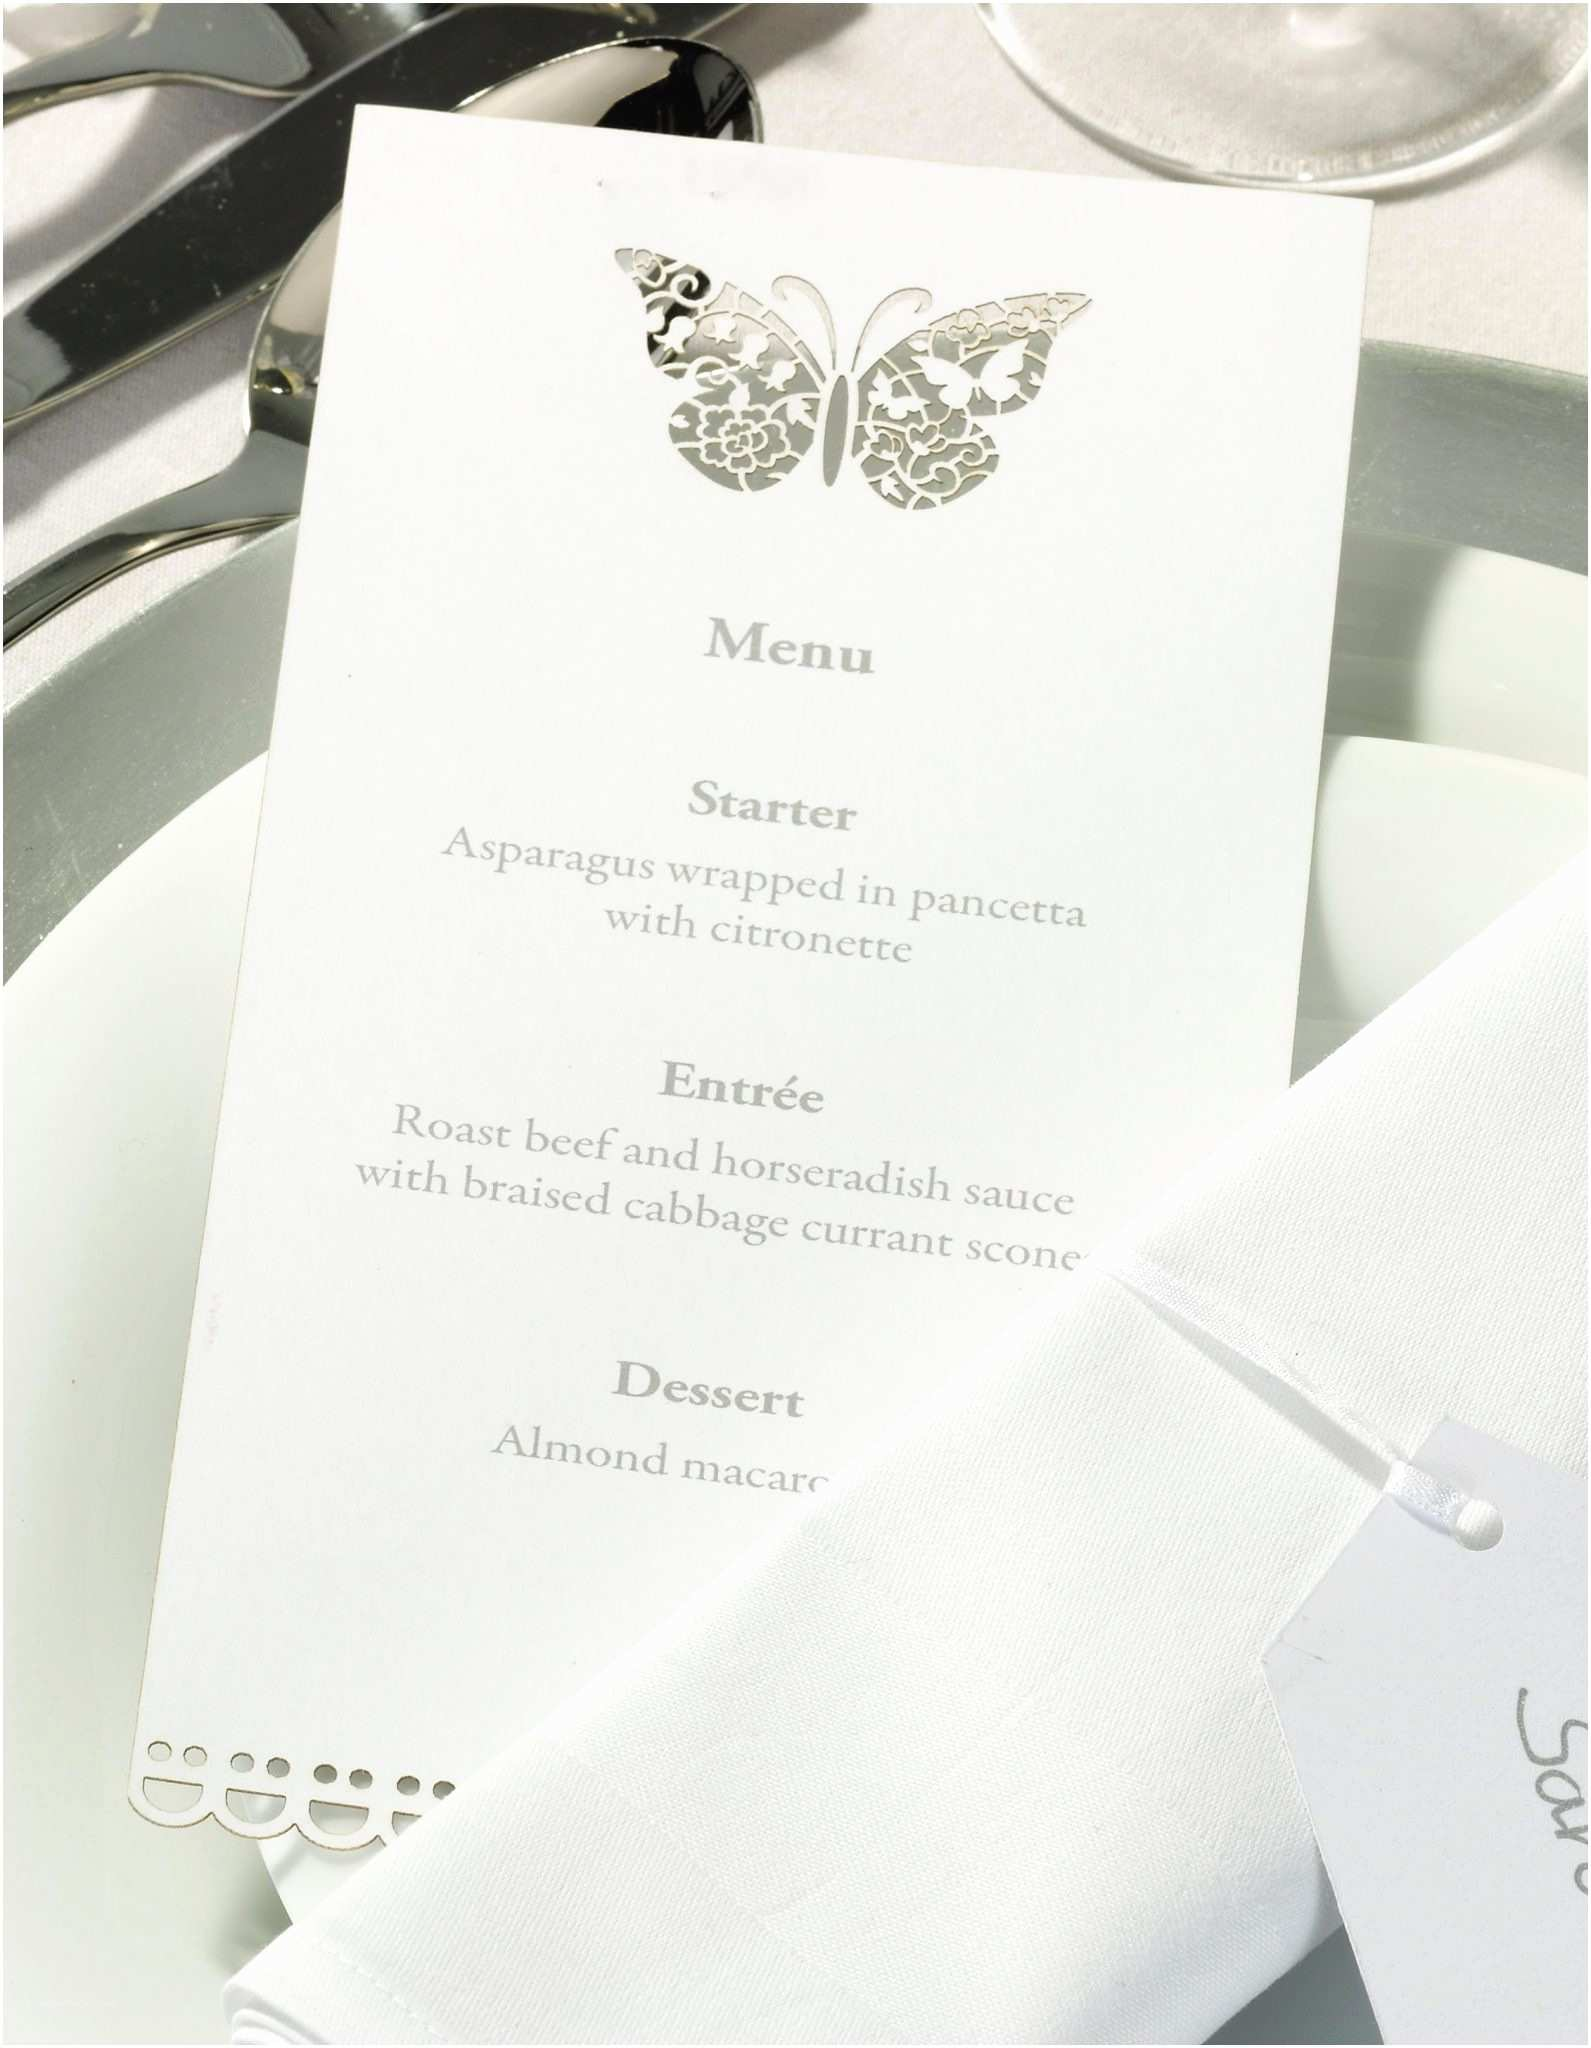 Wilton Wedding Invitation Kits Wedding Invitation Printers Party for Kids Ideas and